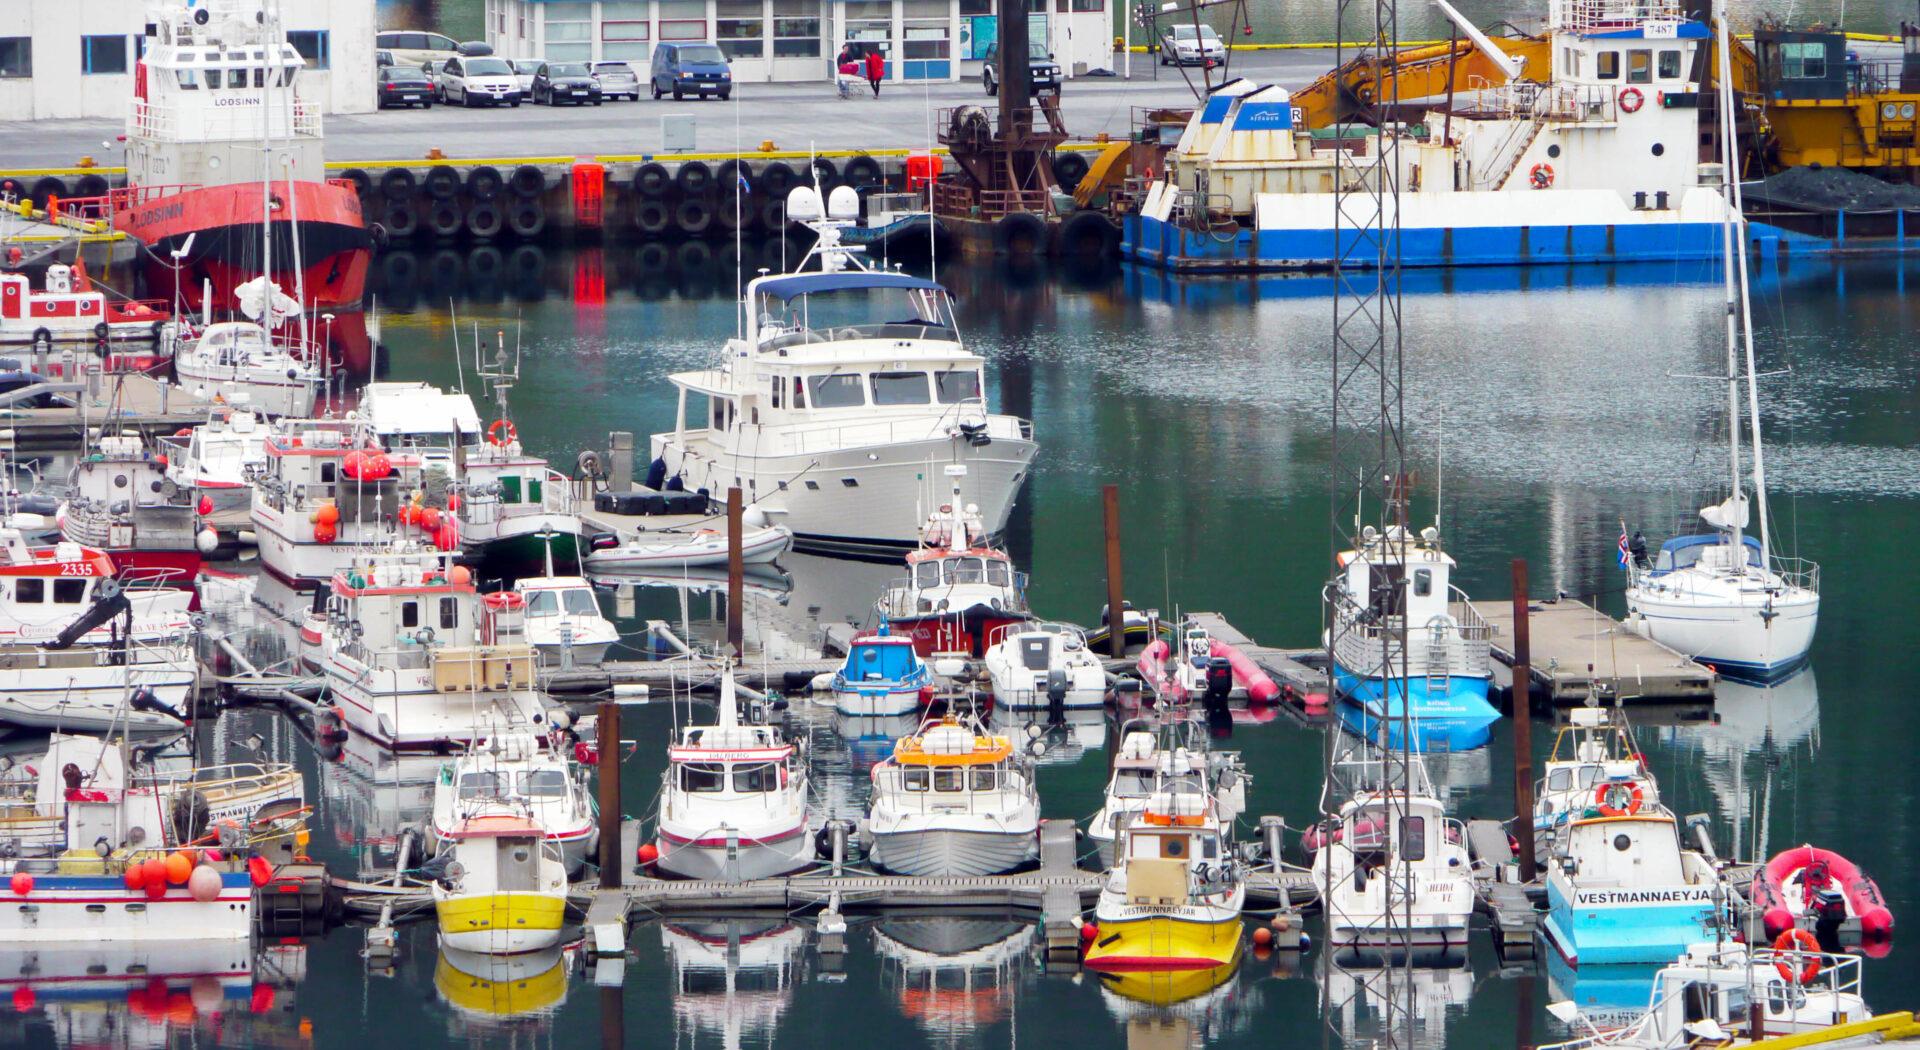 3. P1040580 Venture dominates Heimaey harbour